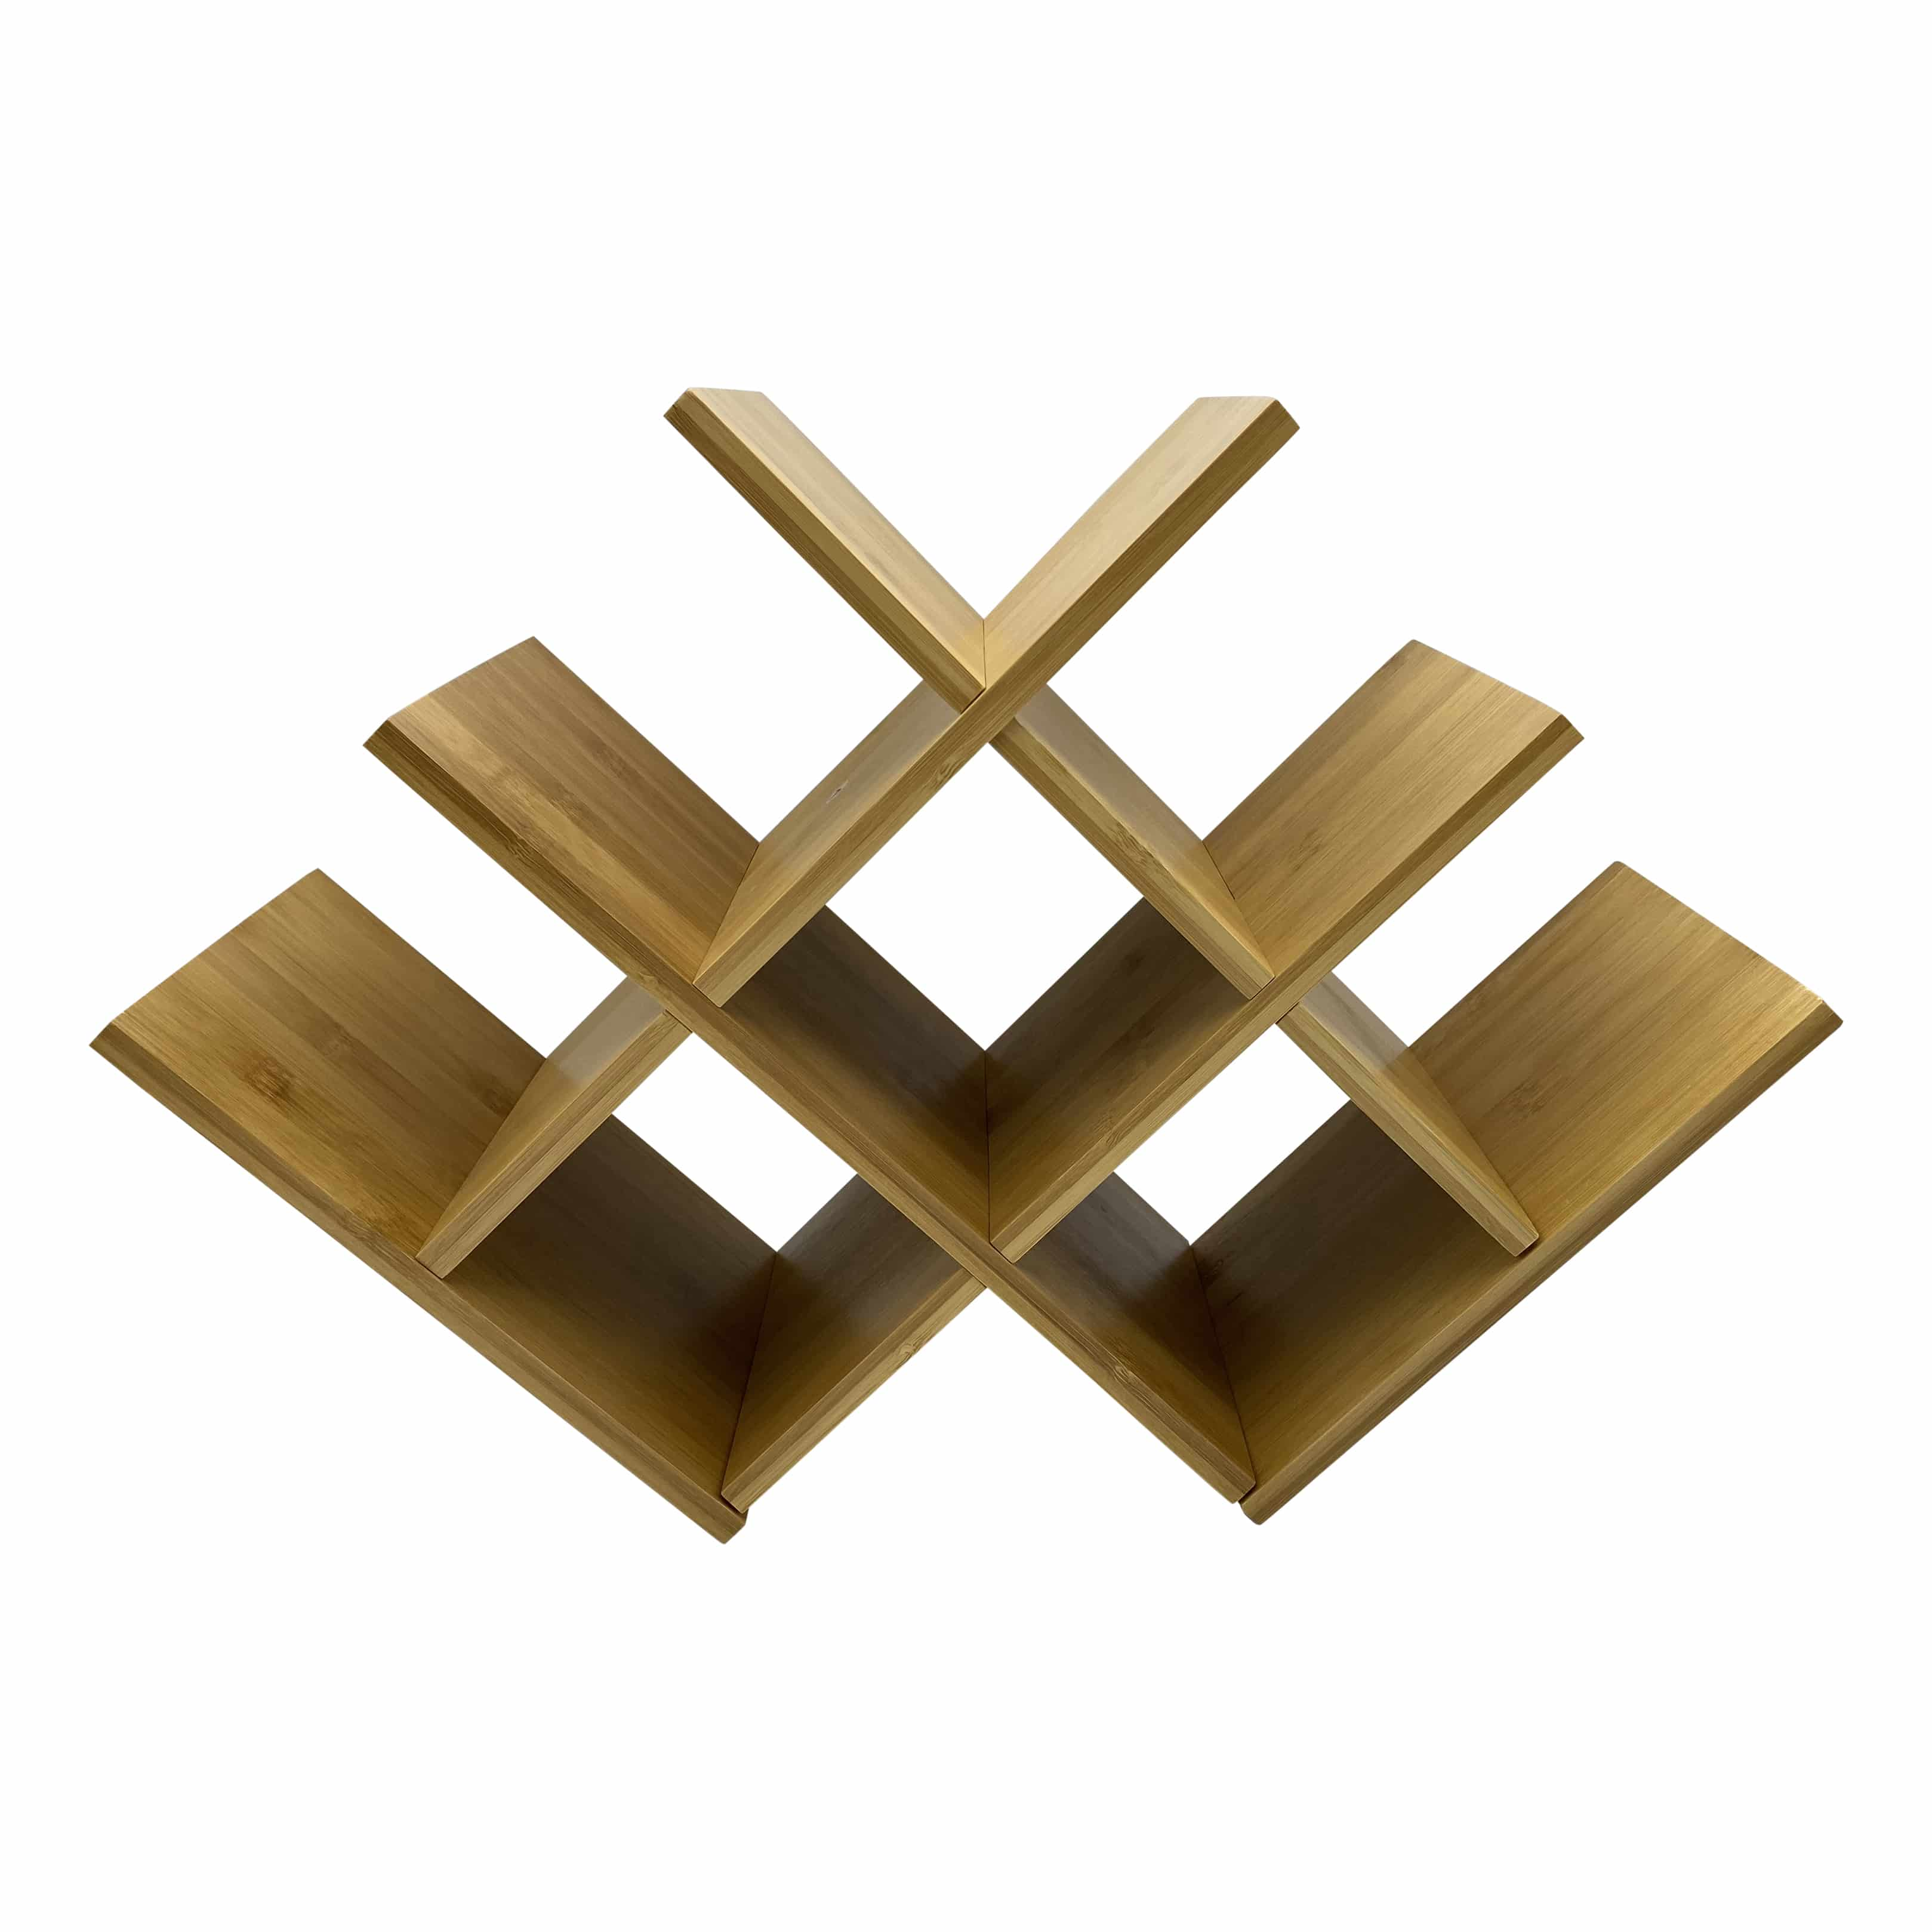 4goodz wijnrek 8 flessen bamboe 46,5x16,5x32 cm